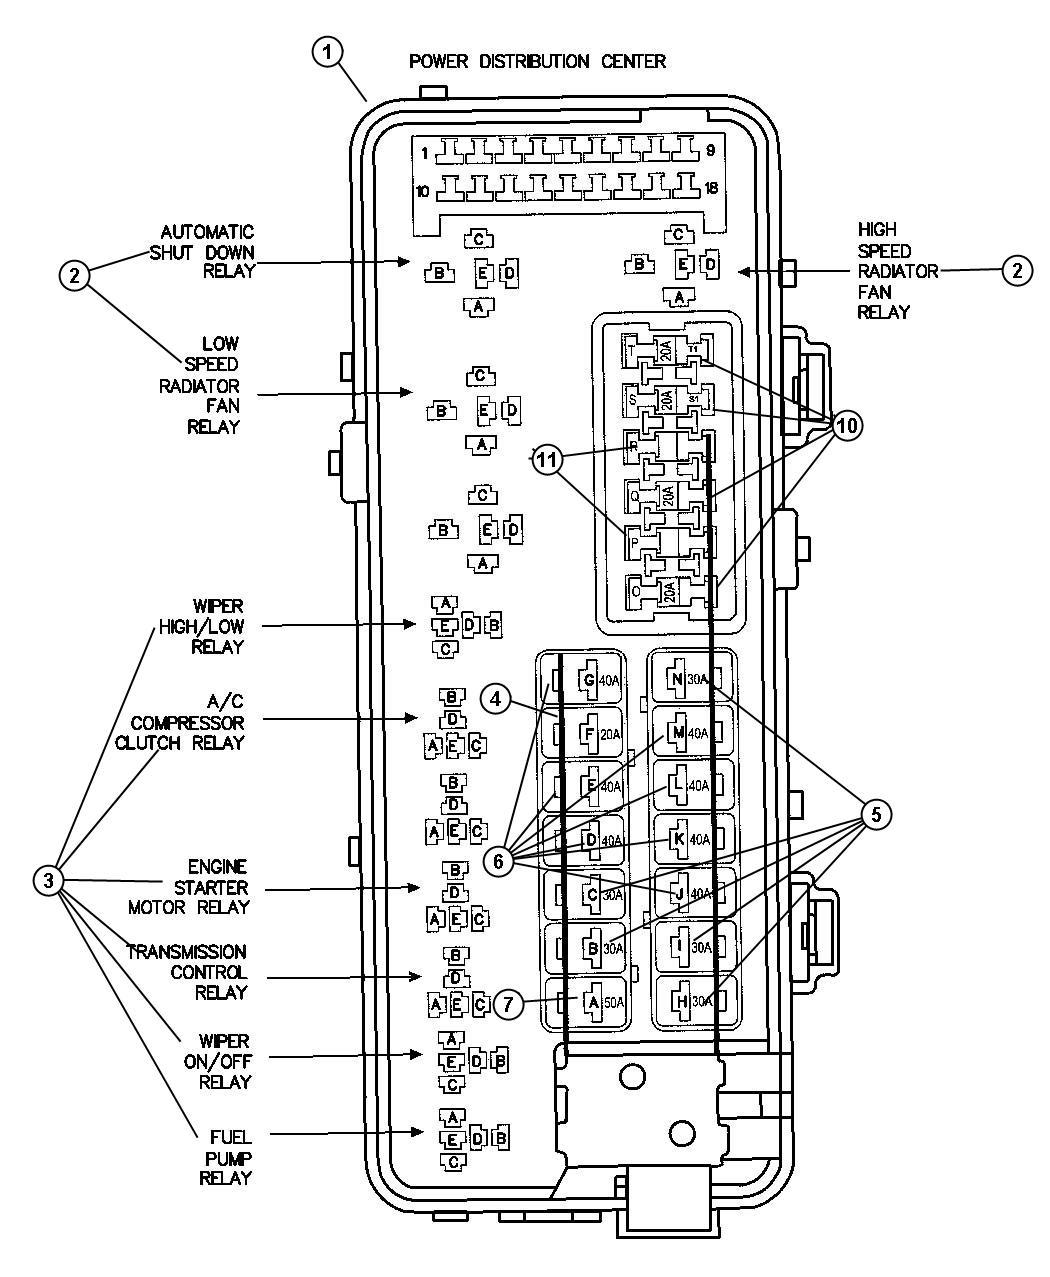 2000 chrysler concorde lxi radio wiring diagram